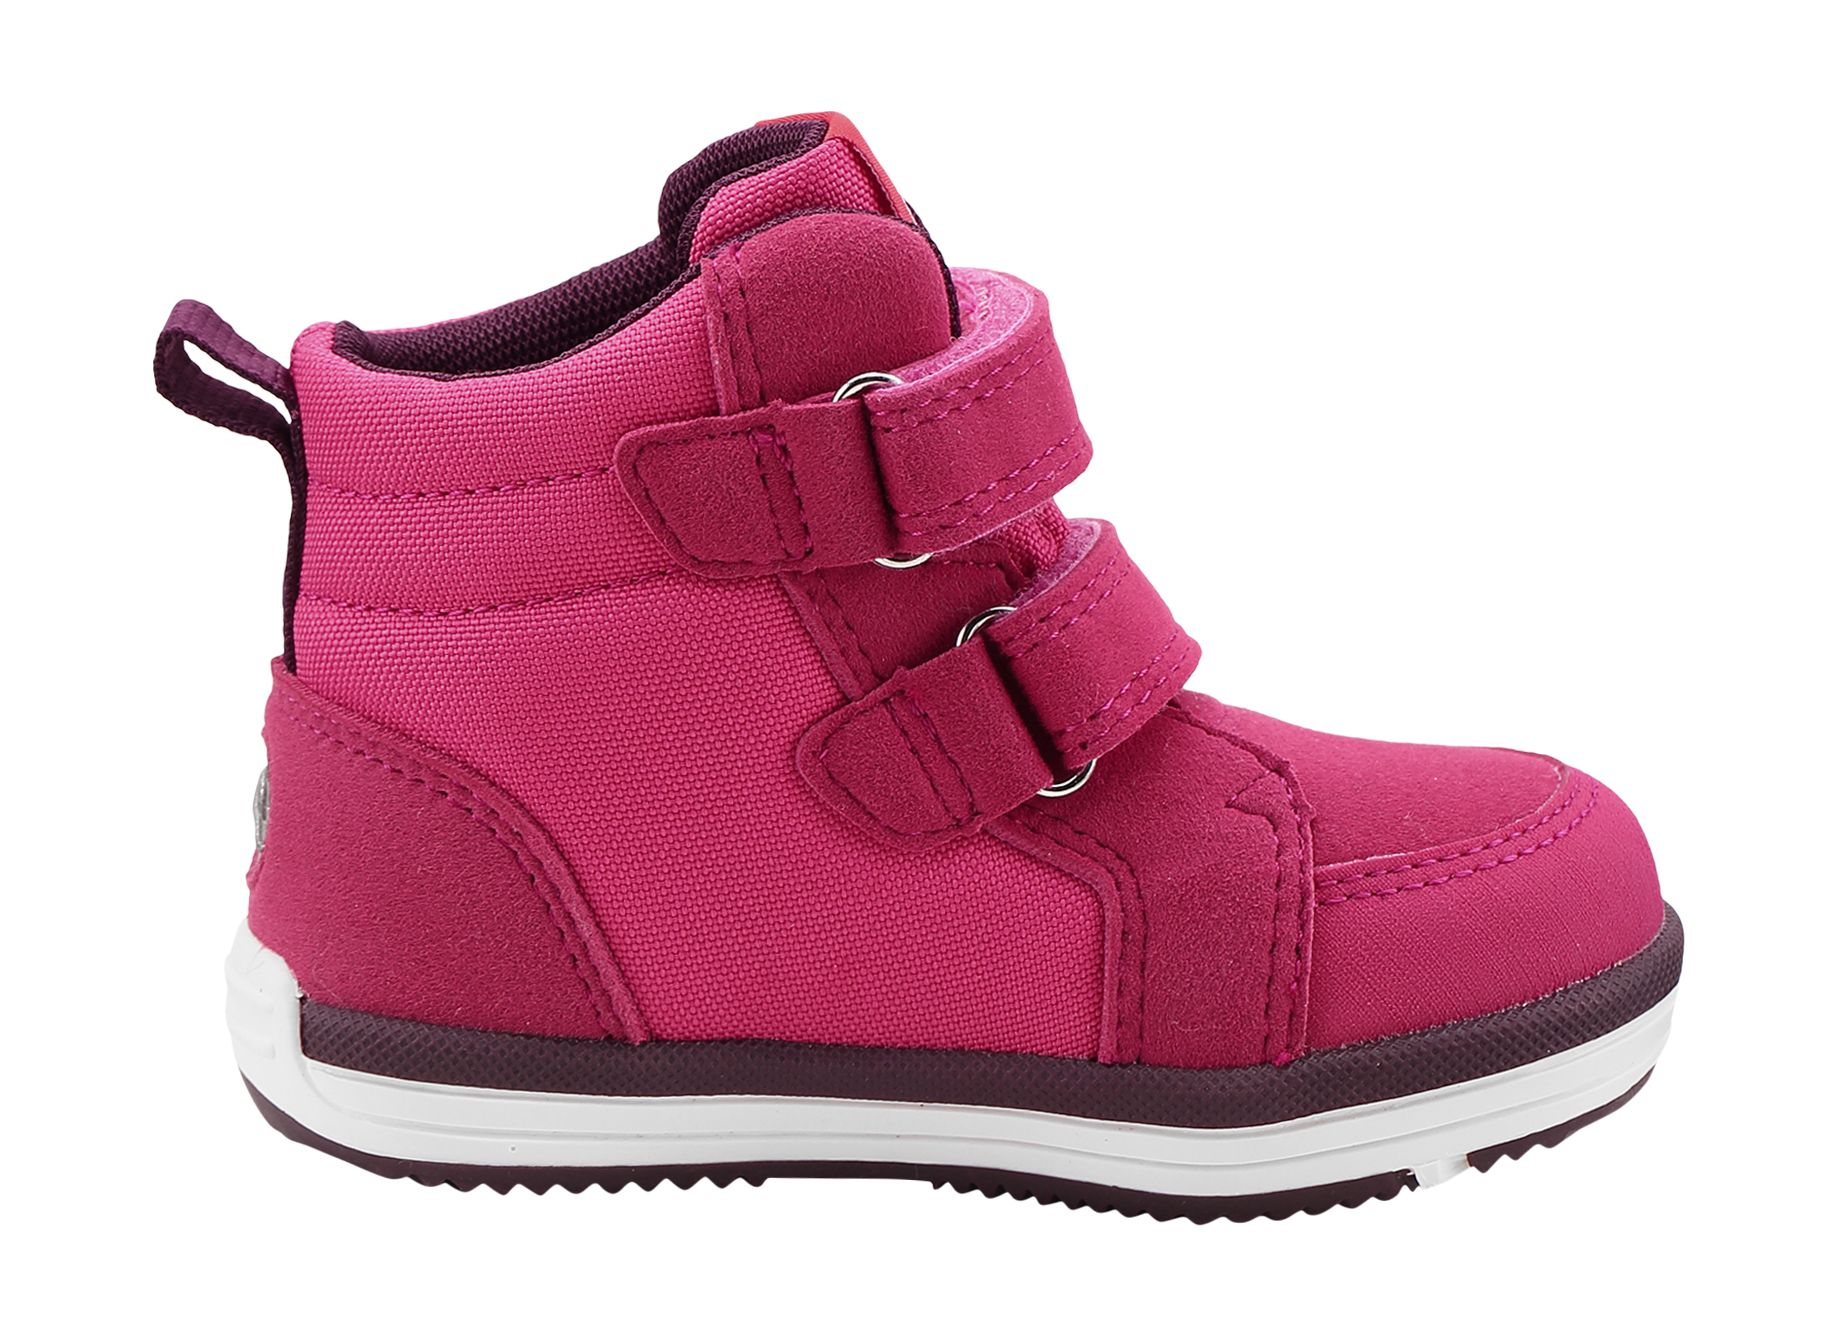 REIMA Patter Raspberry Pink 25